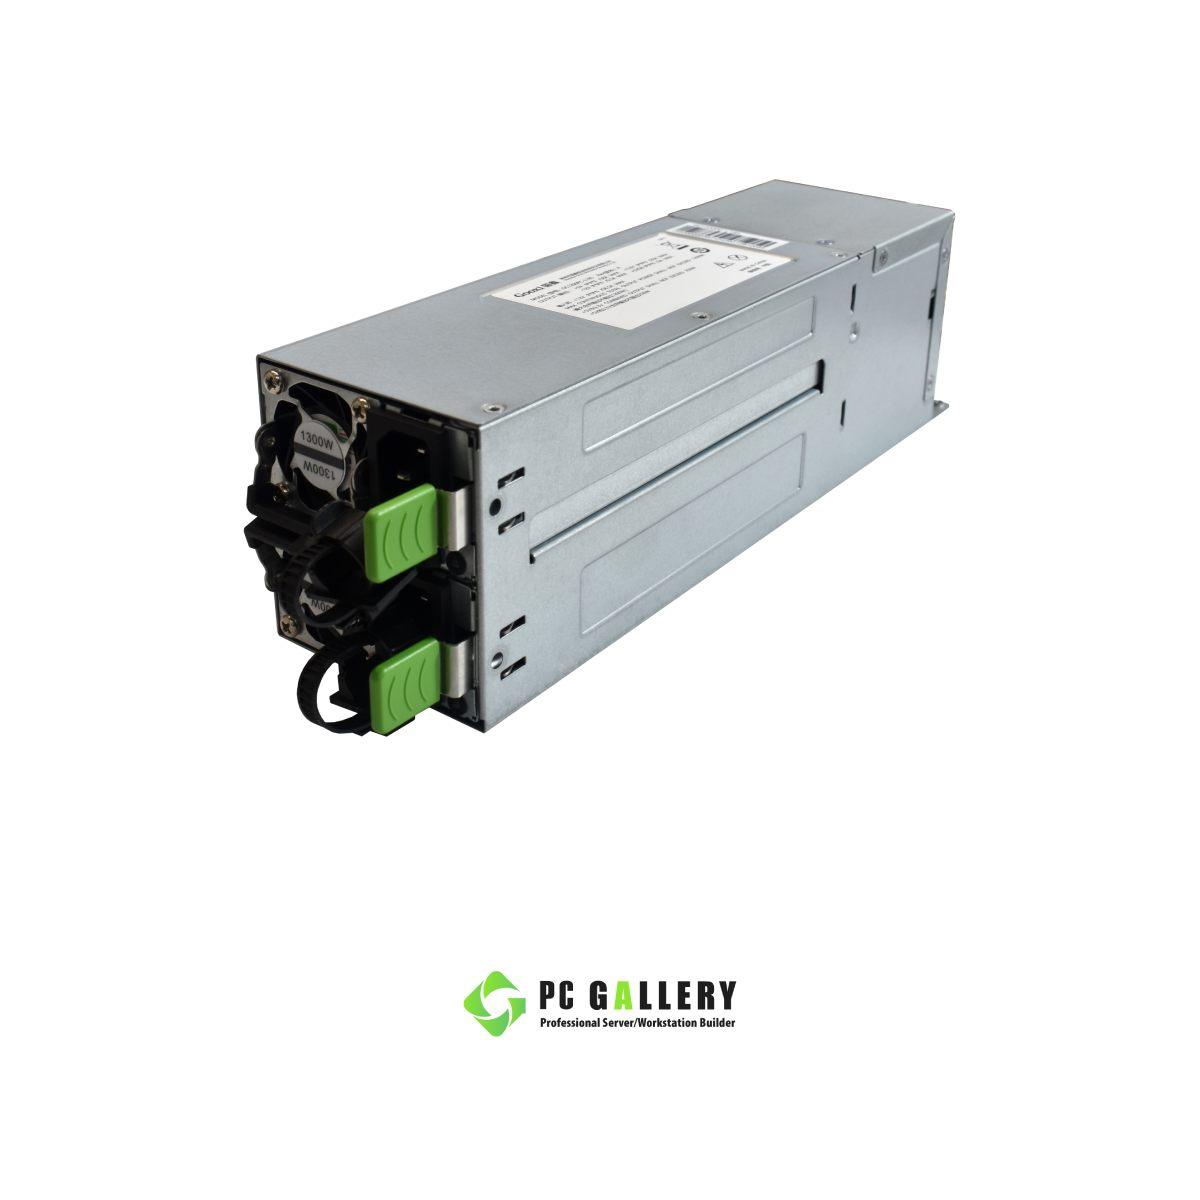 Gooxi, Redundant Power, GC1200PC-L185-01